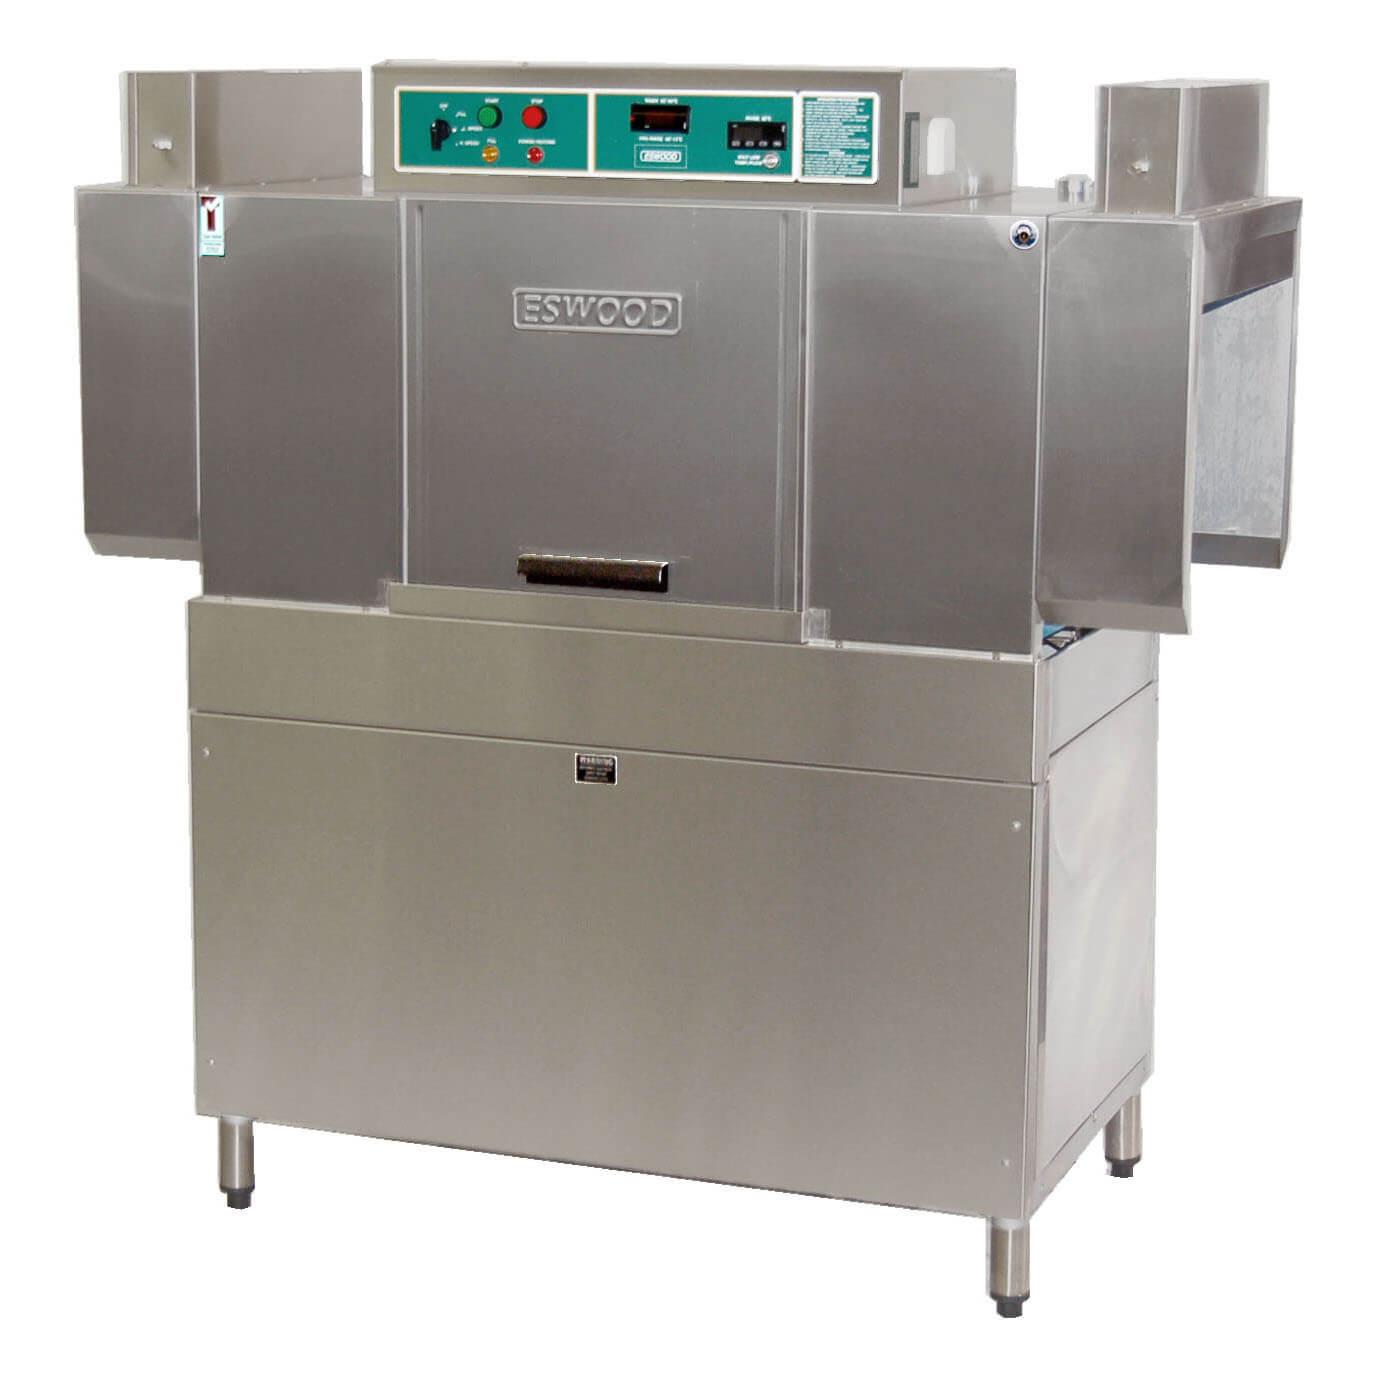 Eswood ES100 Rack Conveyor Dishwasher